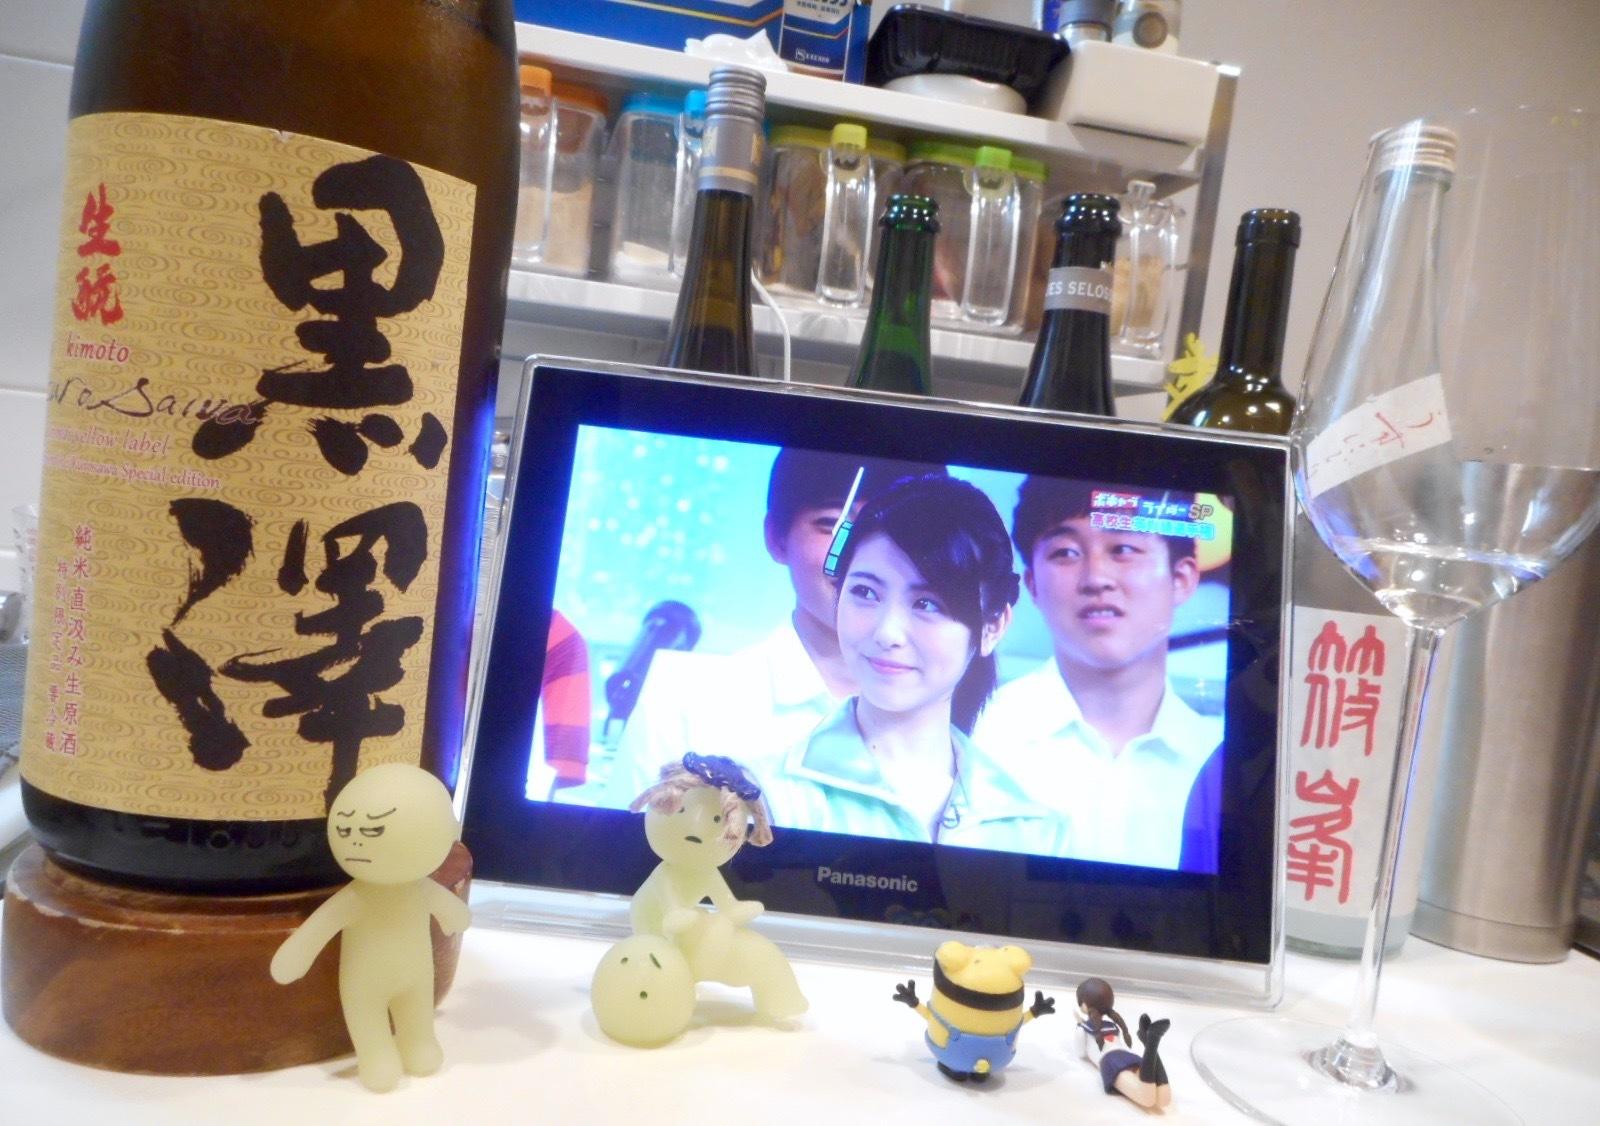 kurosawa_yellow29by3_1.jpg